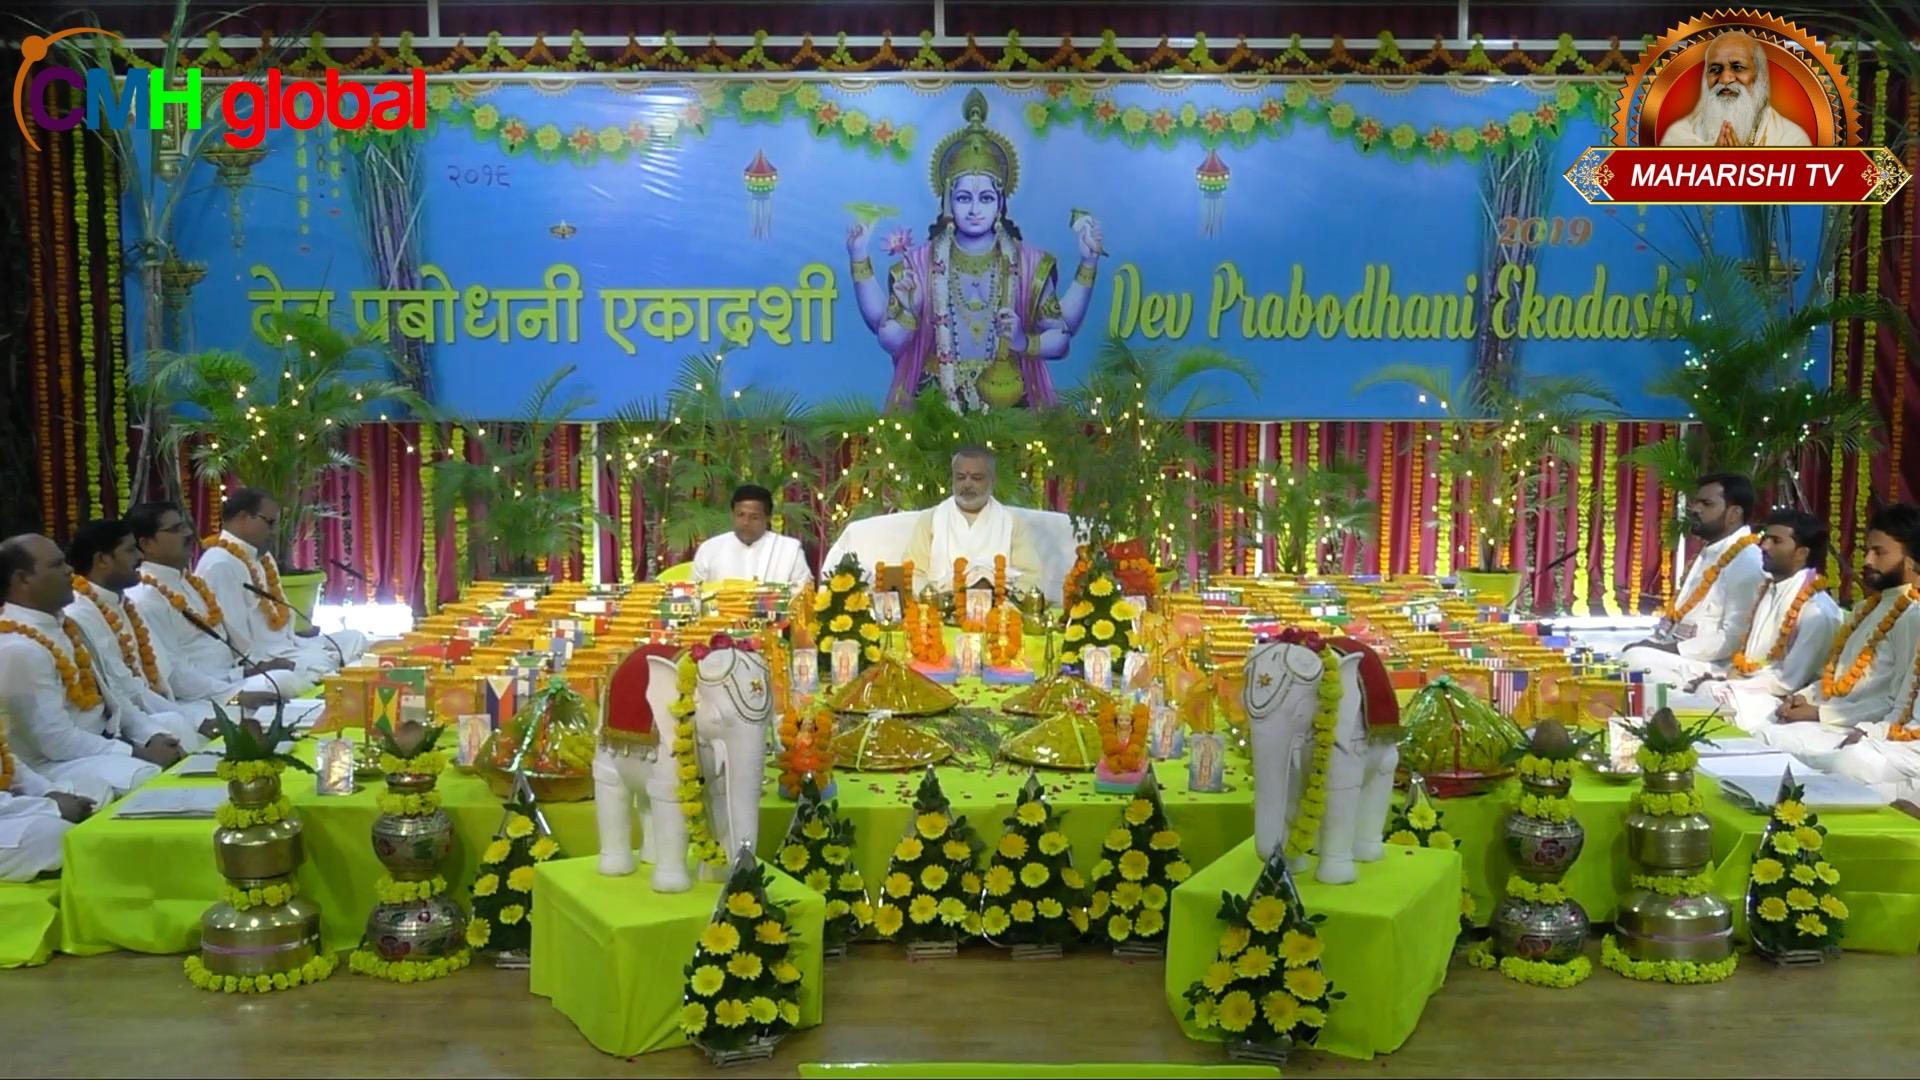 Dev Prabodhani Ekadashi Pujan Ep-02, 2019